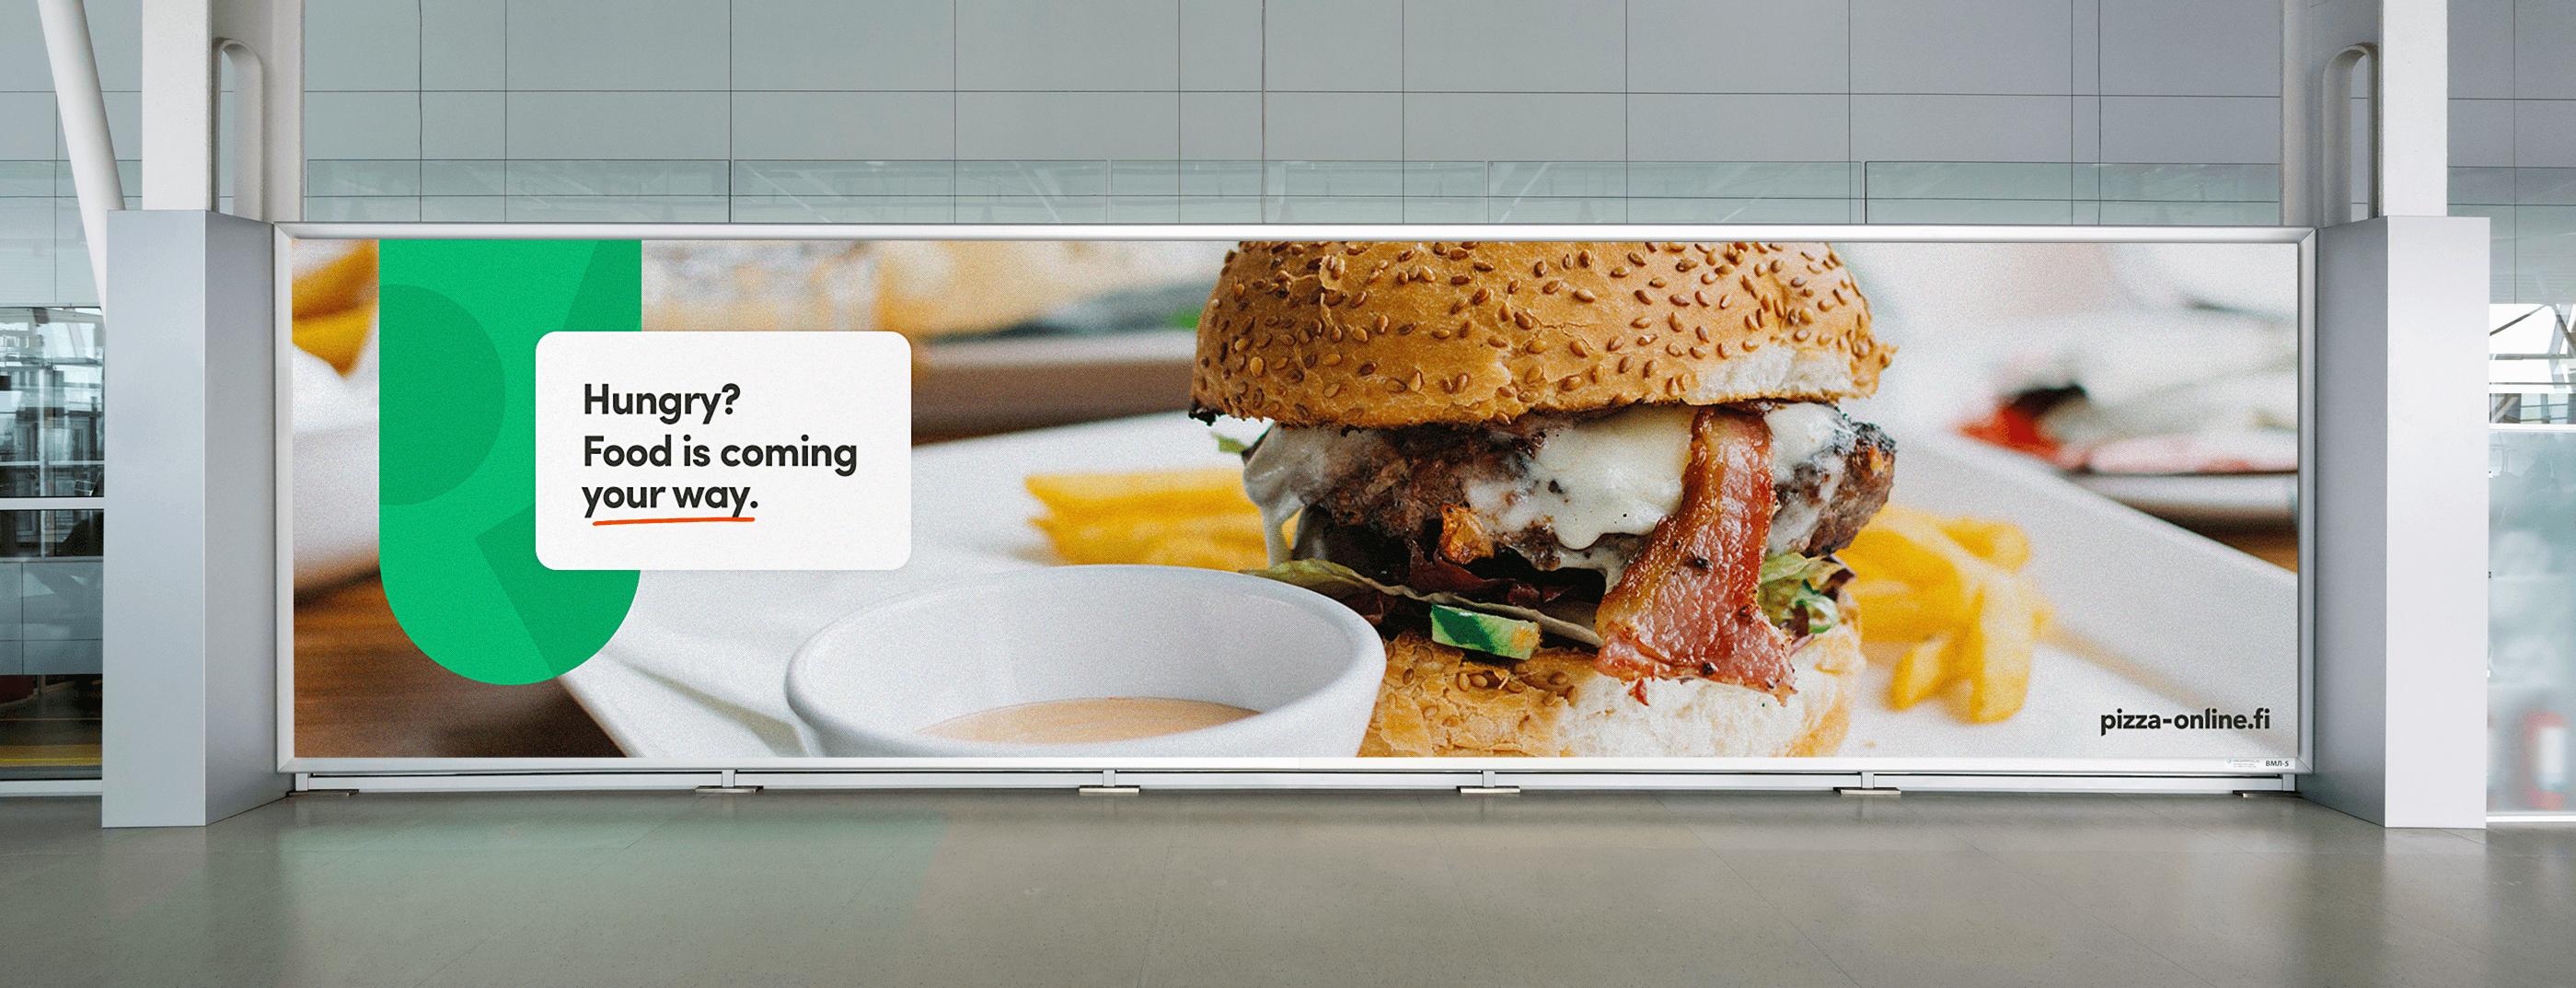 pizza-online-billboard